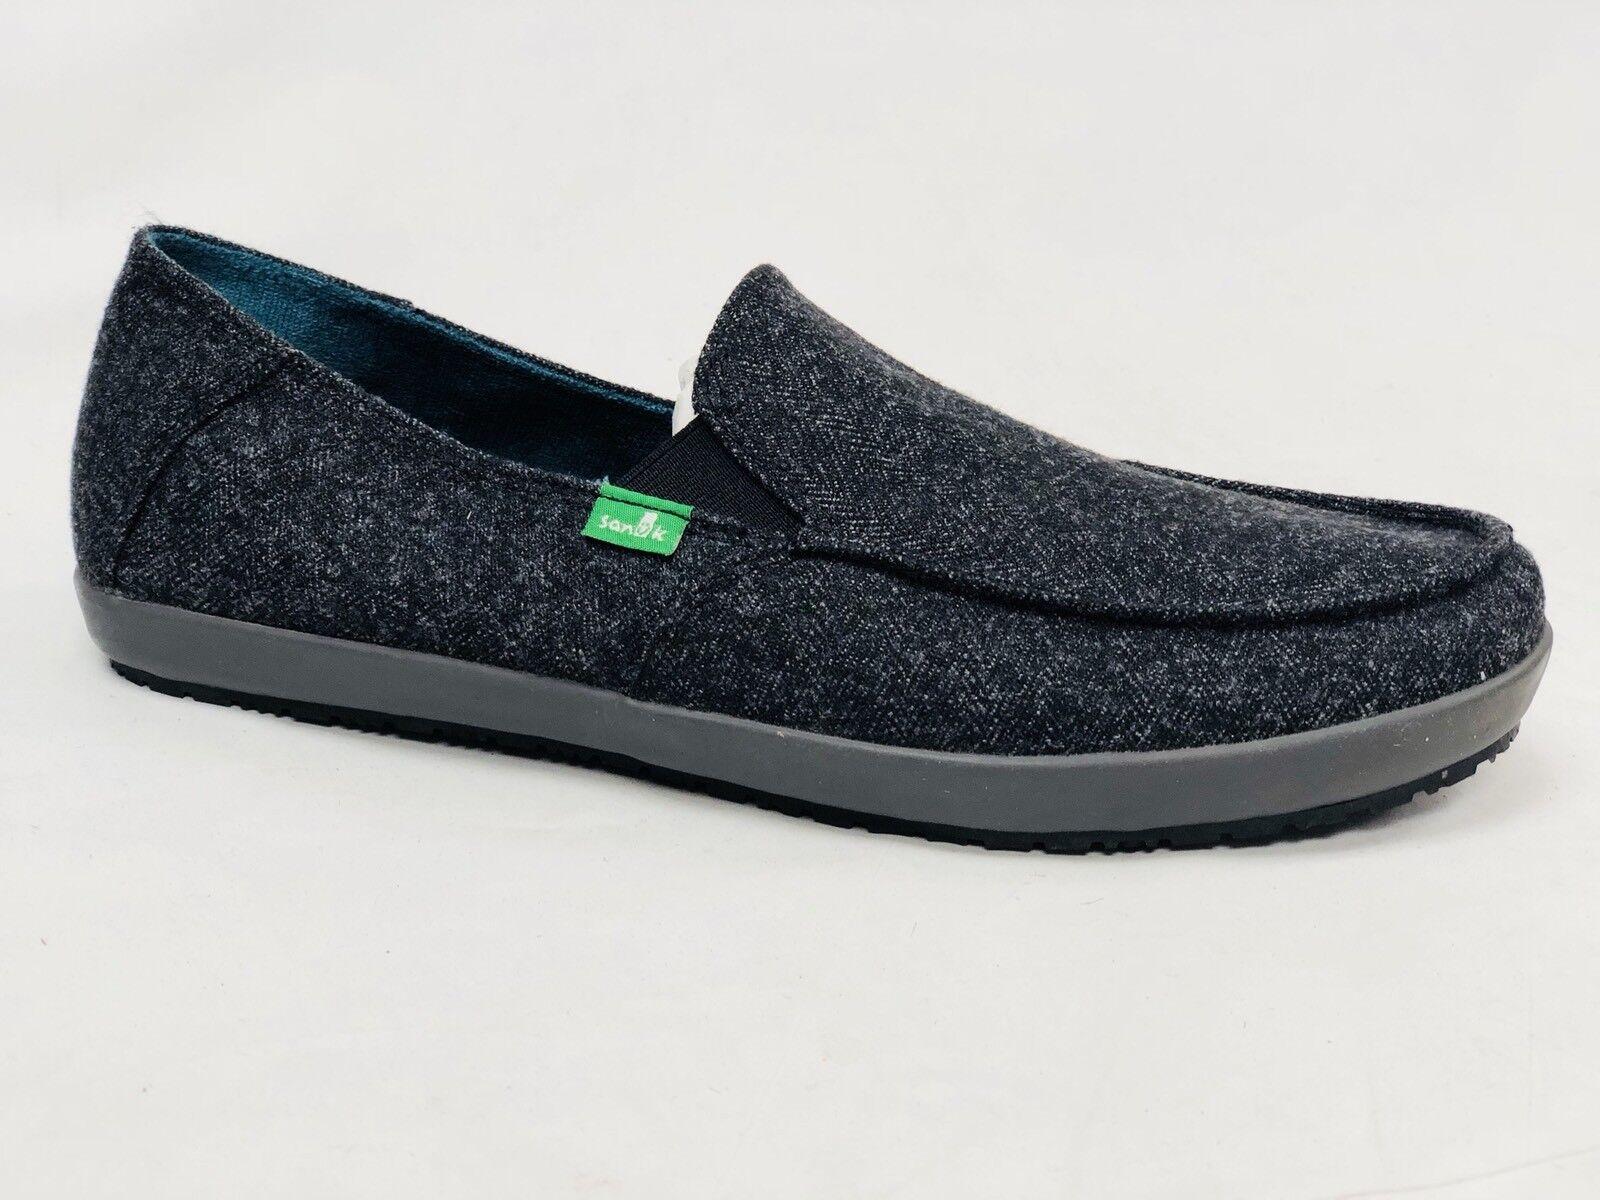 SANUK CASA TX BLACK HERRING BOAT CANVAS SHOE MENS SIZE 9 slip on loafer SMF10510